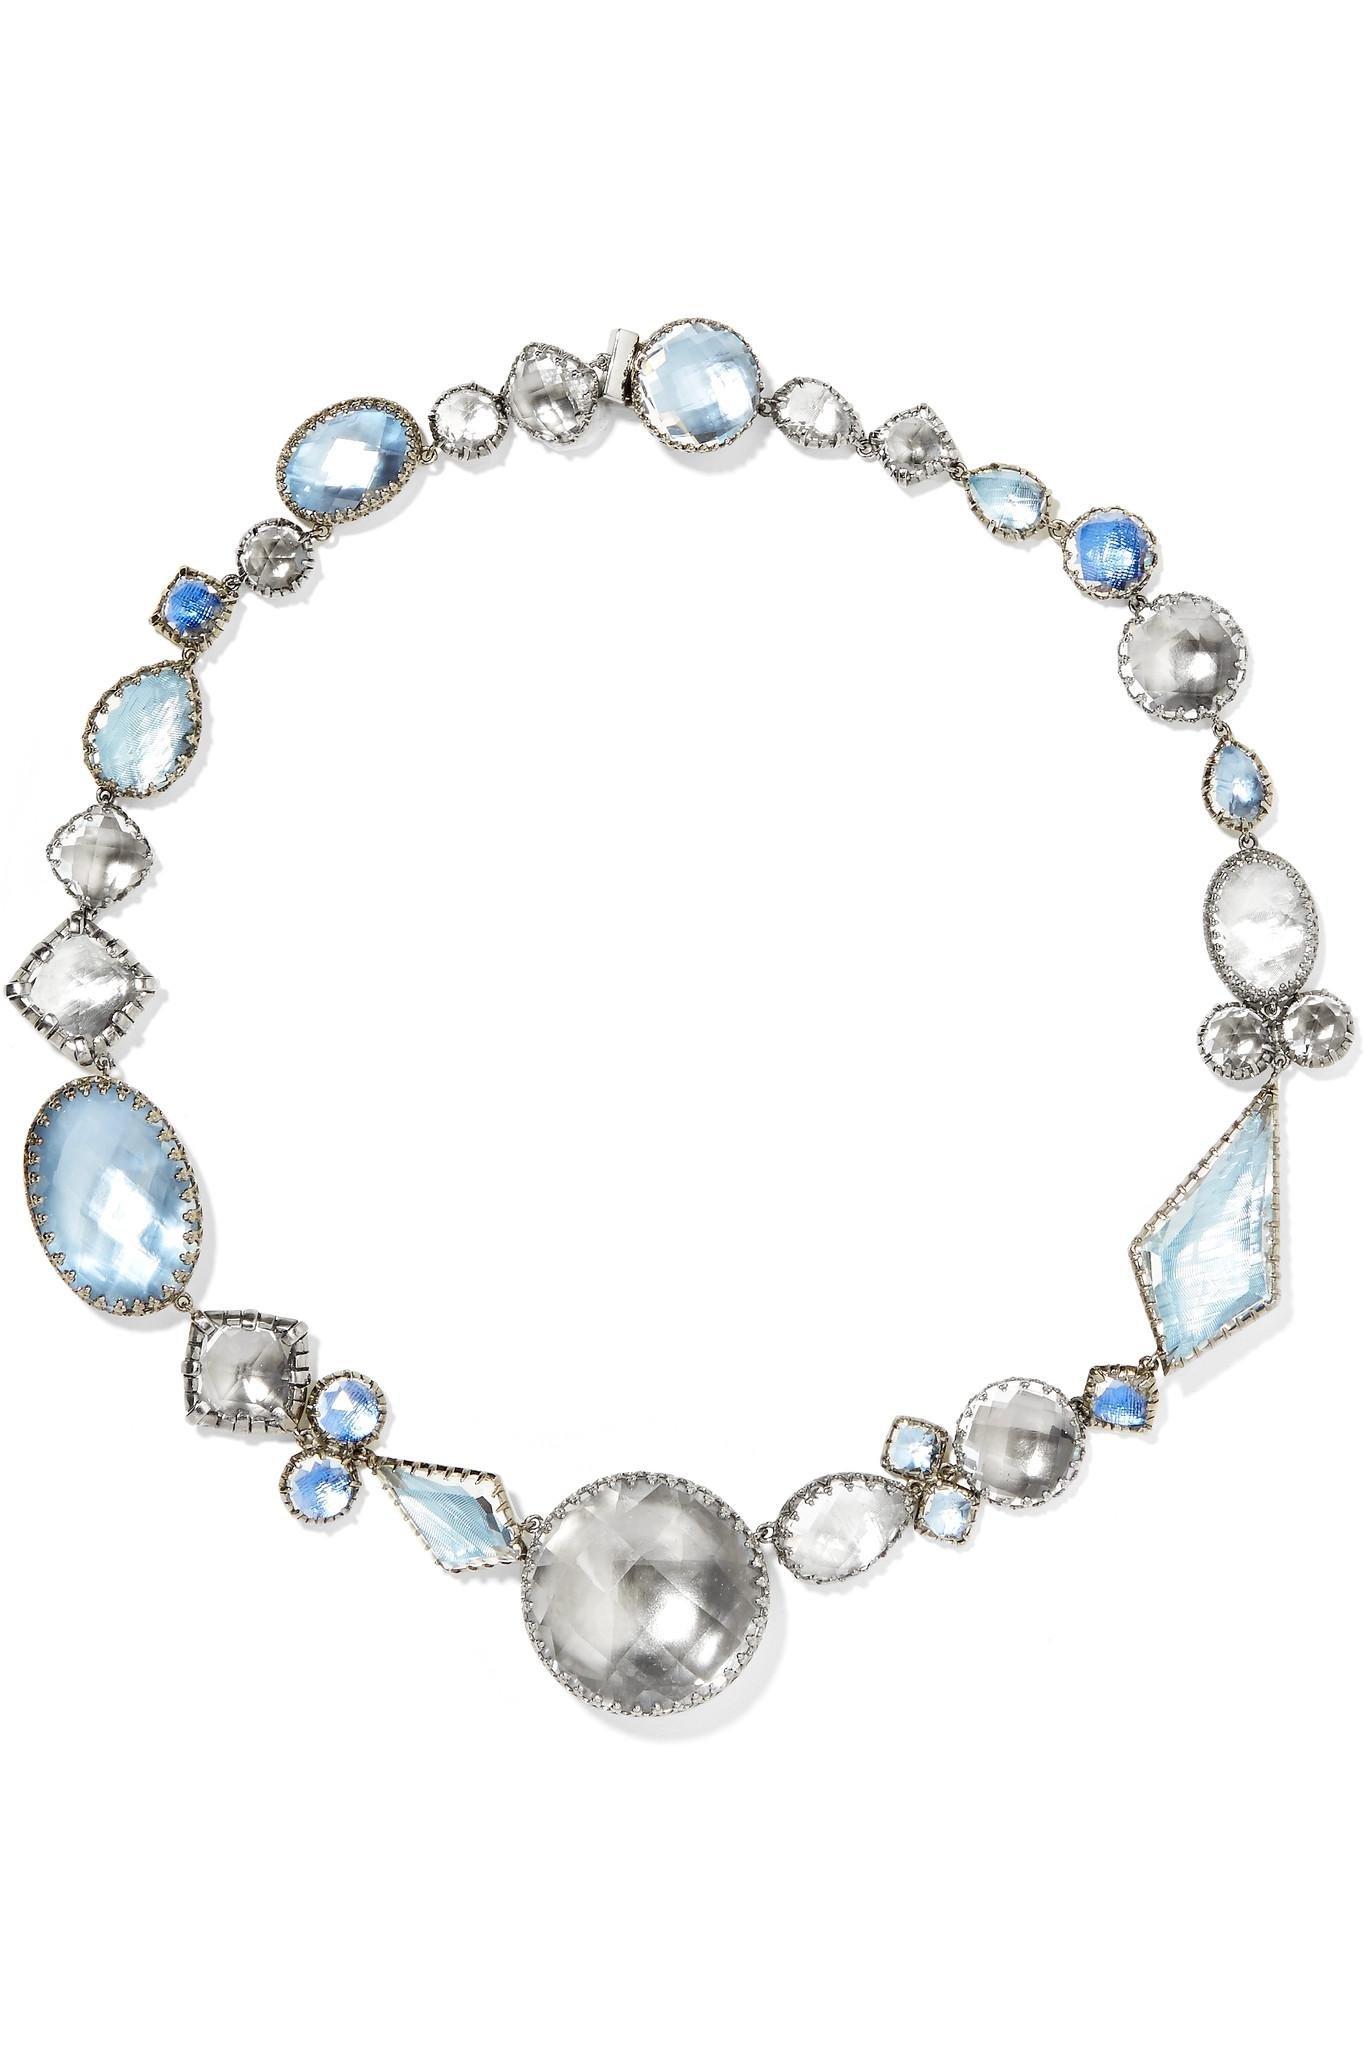 Larkspur & Hawk Sadie Rivière Rhodium-dipped Quartz Necklace - Silver DDteB